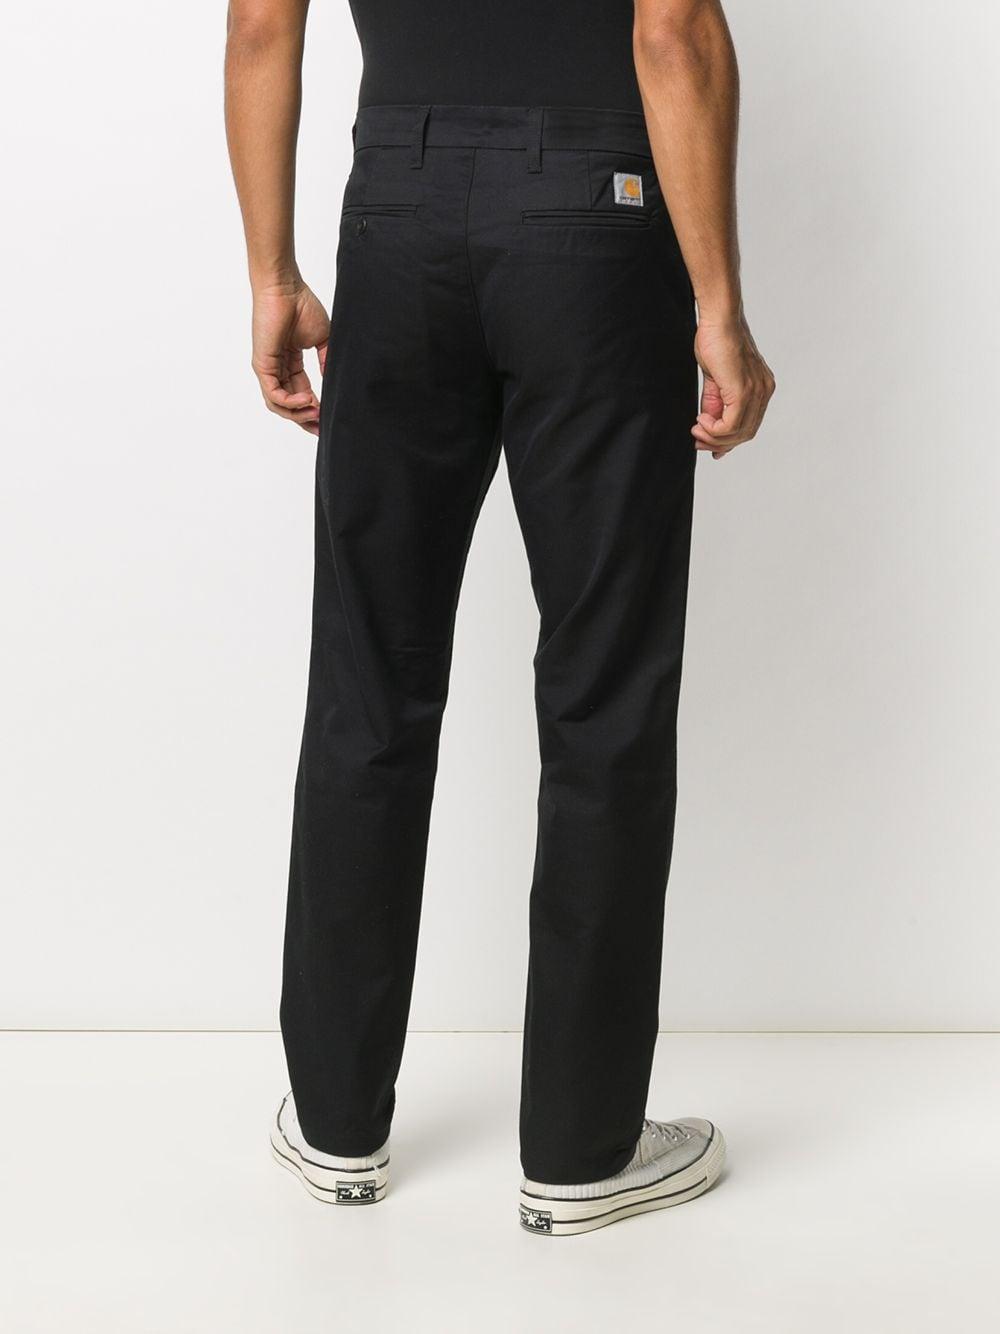 sid pants man black in cotton CARHARTT WIP | Trousers | I00336789.02